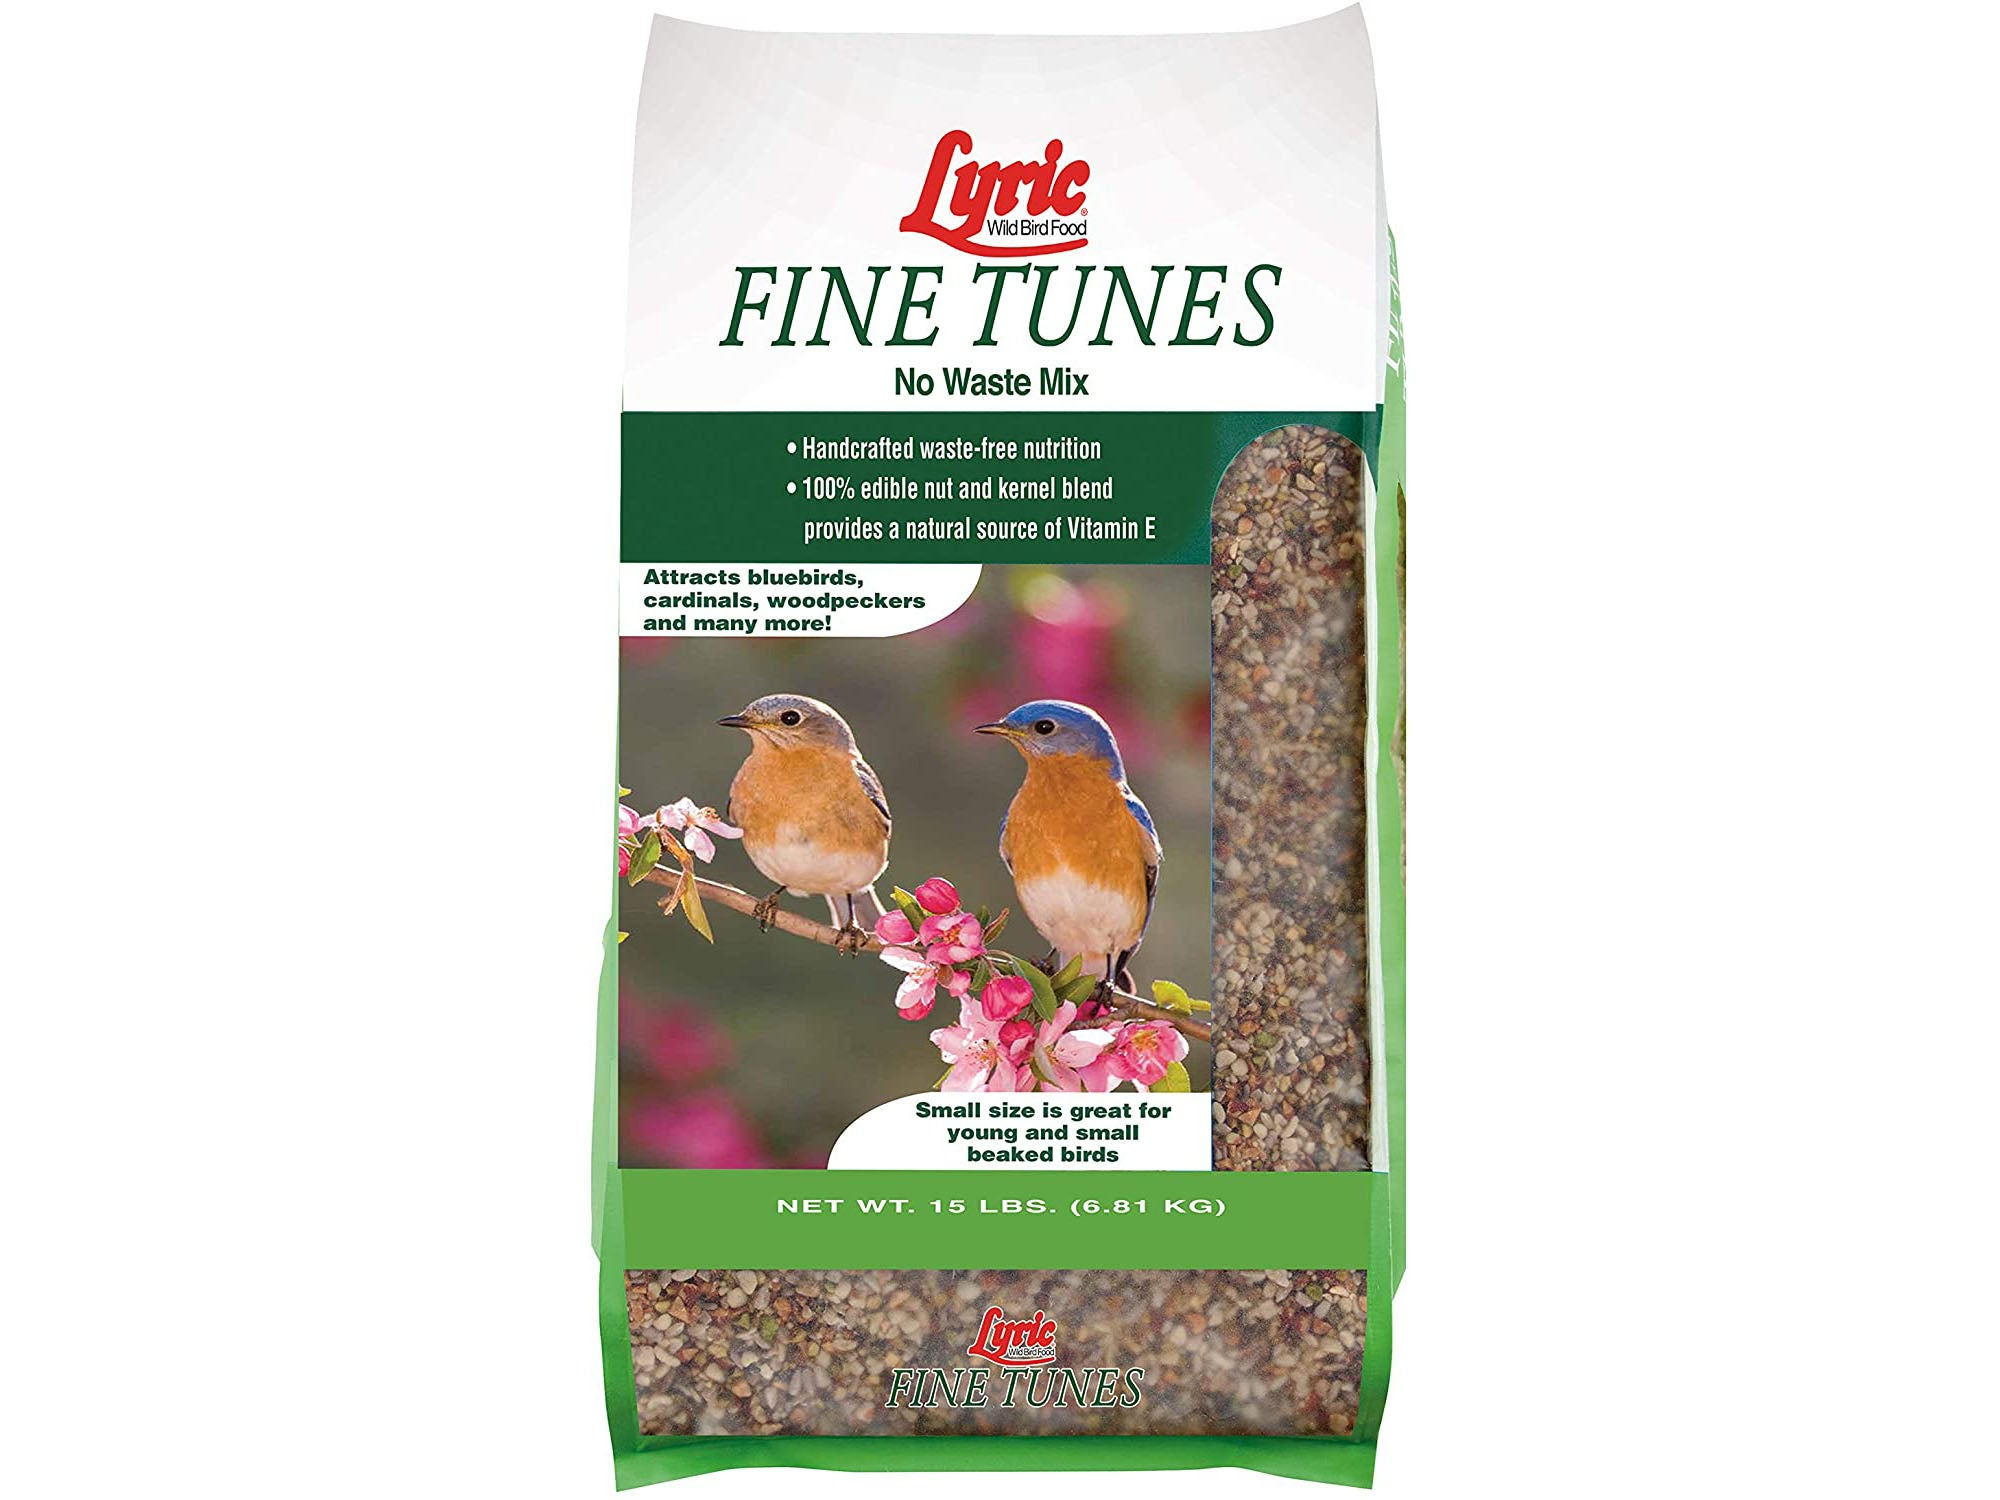 Lyric premium bird seed